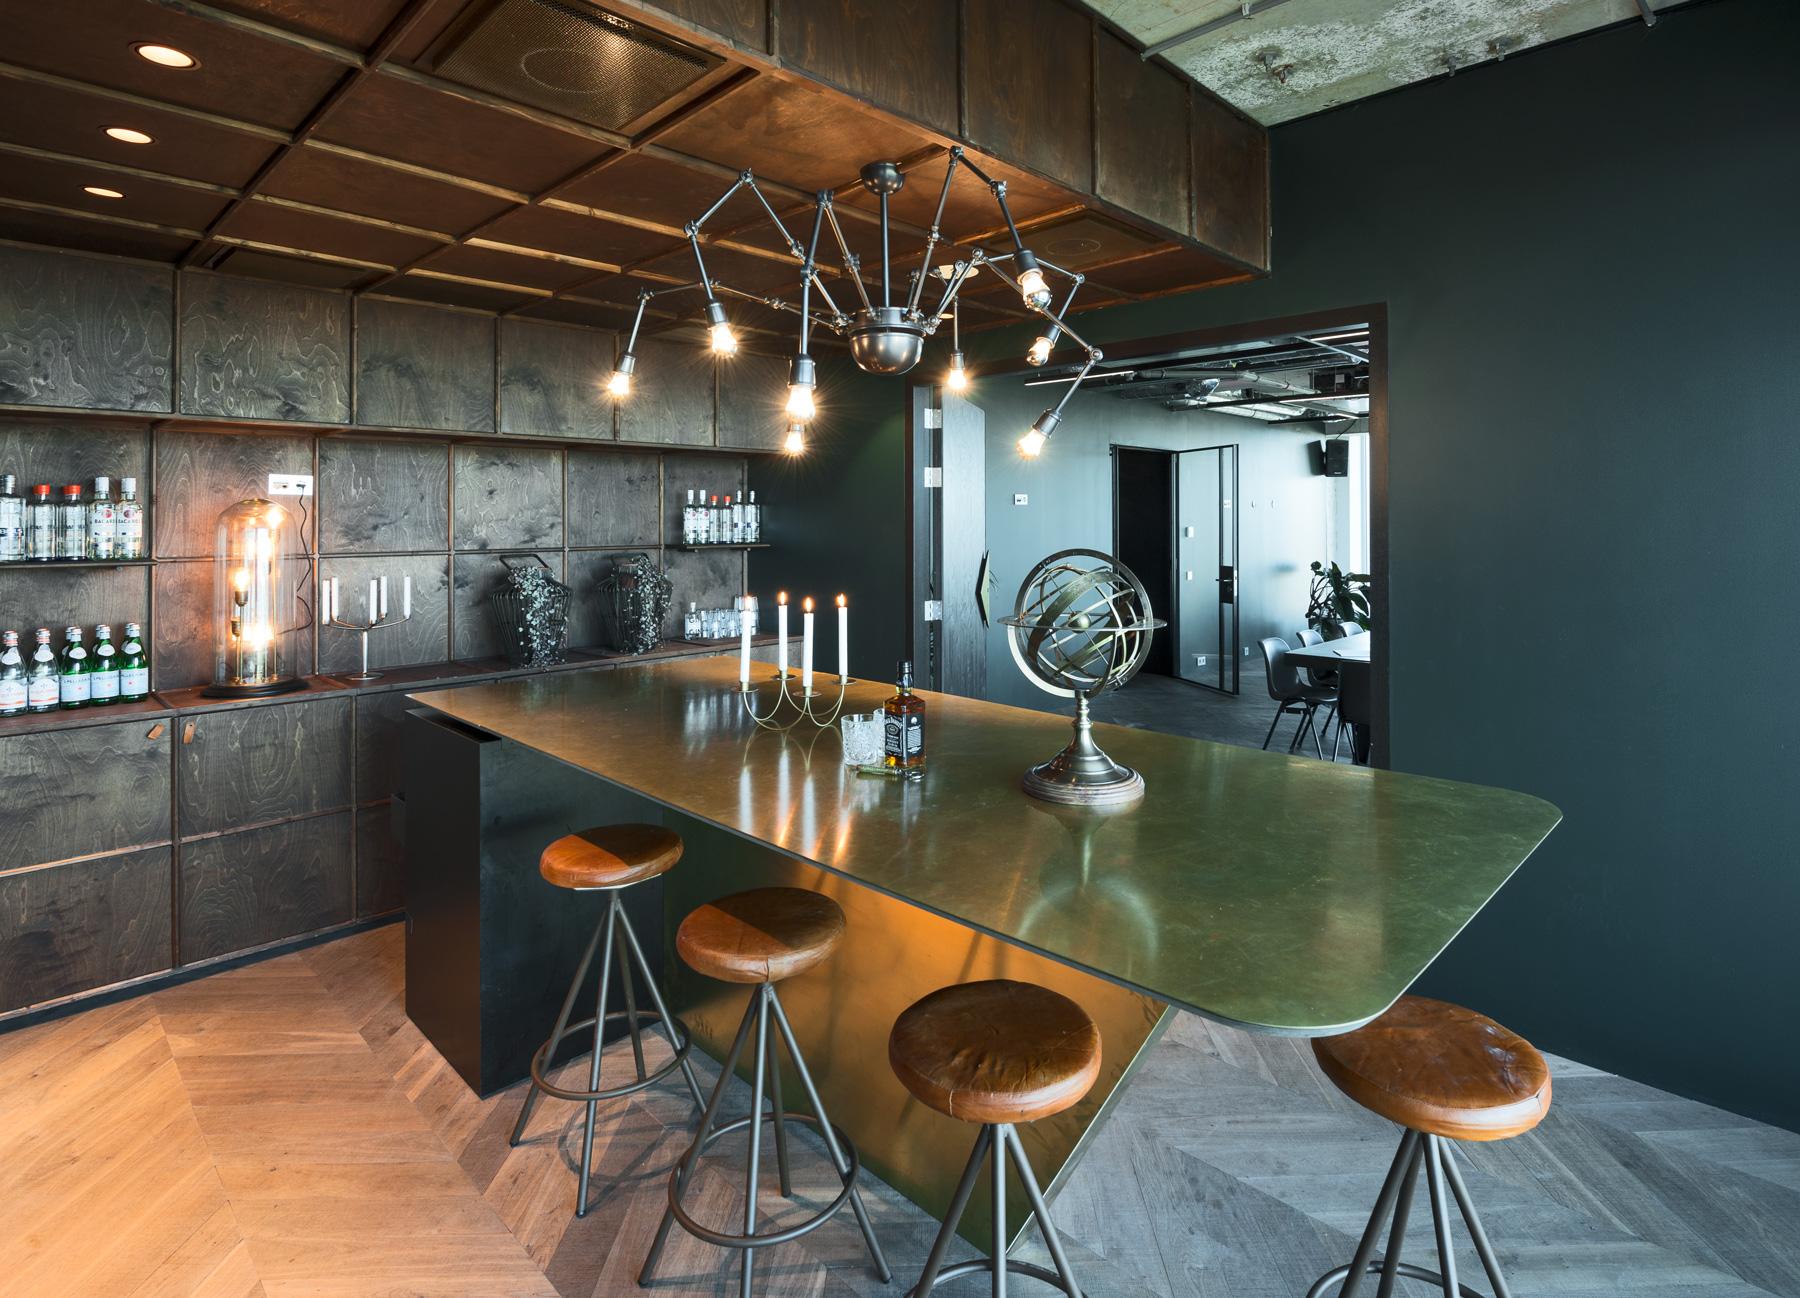 The Press Room - Oppervlakte: 49 m² + 18 m²Dimensies: 6 x 9 m + 6 x 3 mHoogte: 2.75 mCapaciteit: 50 gasten (max)Plattegrond (PDF)